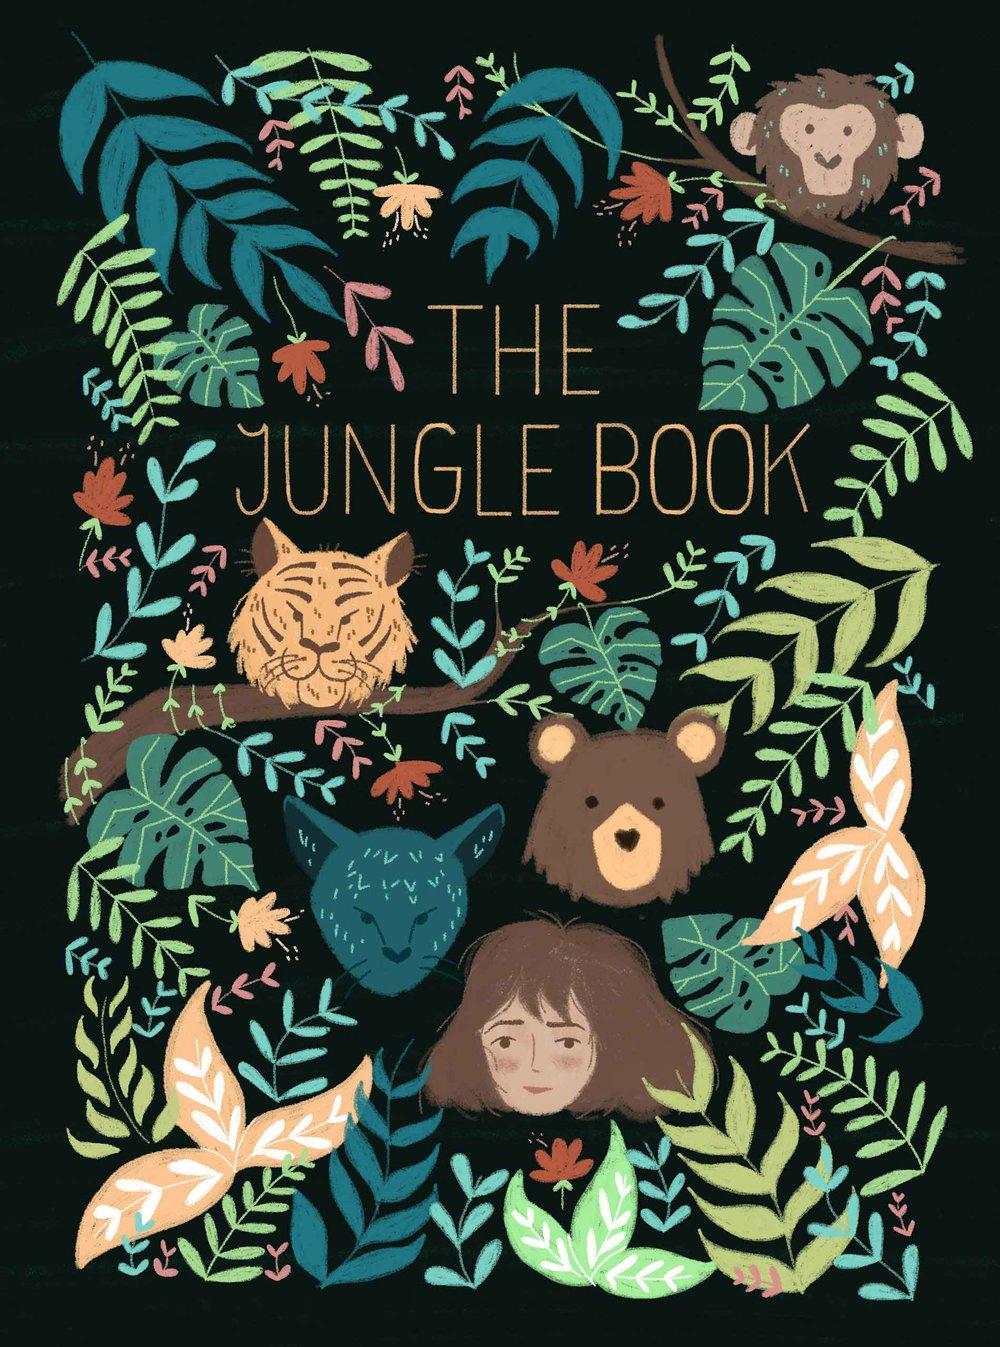 The Jungle Book Illustration